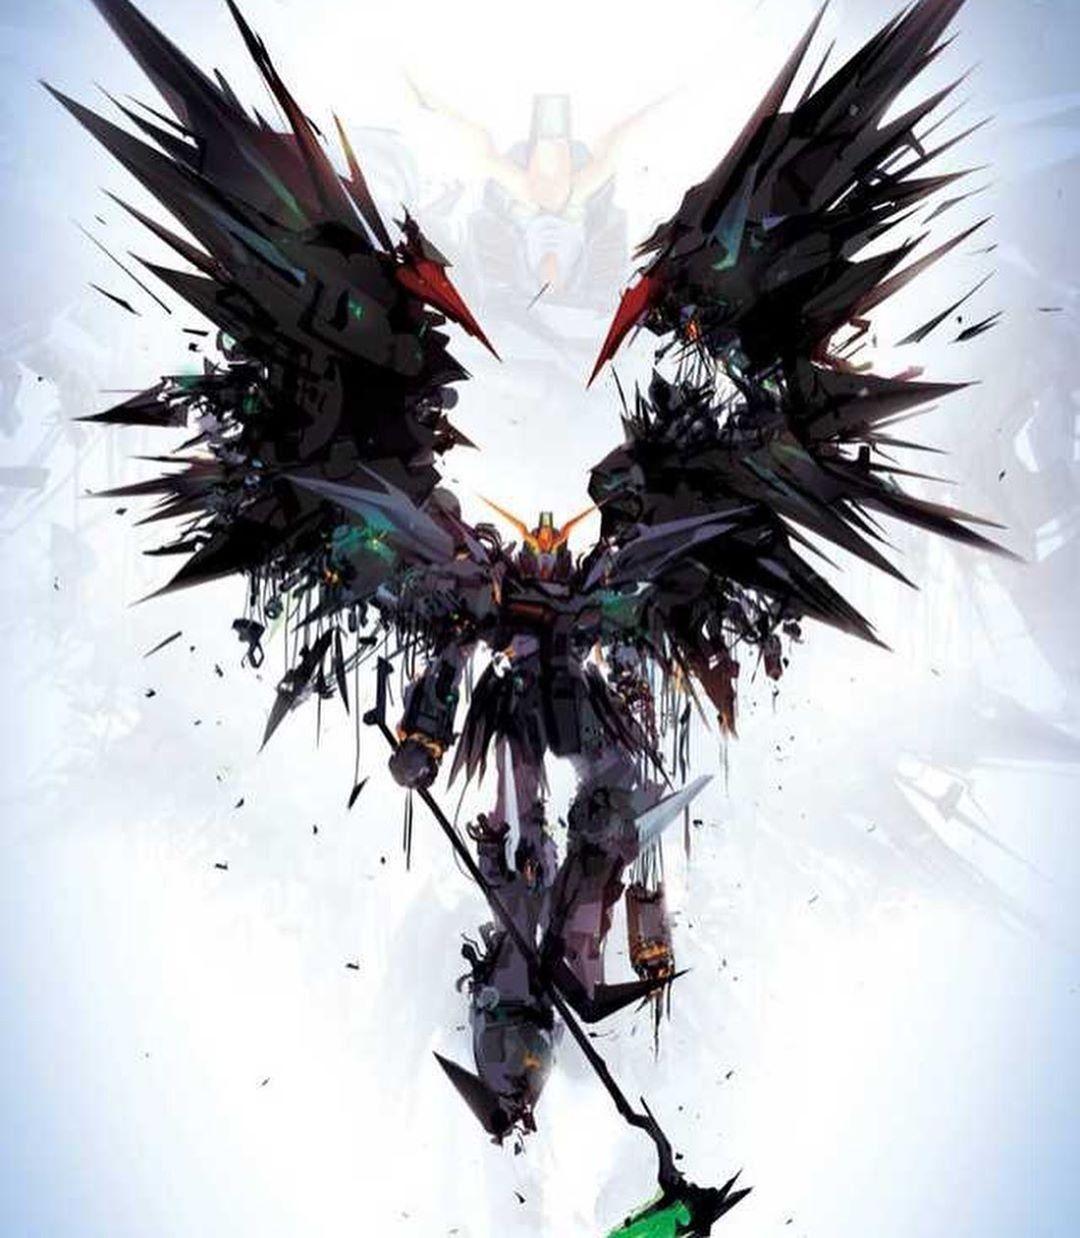 Pilot Duo Maxwell Gundam wallpapers, Gundam, Gundam art